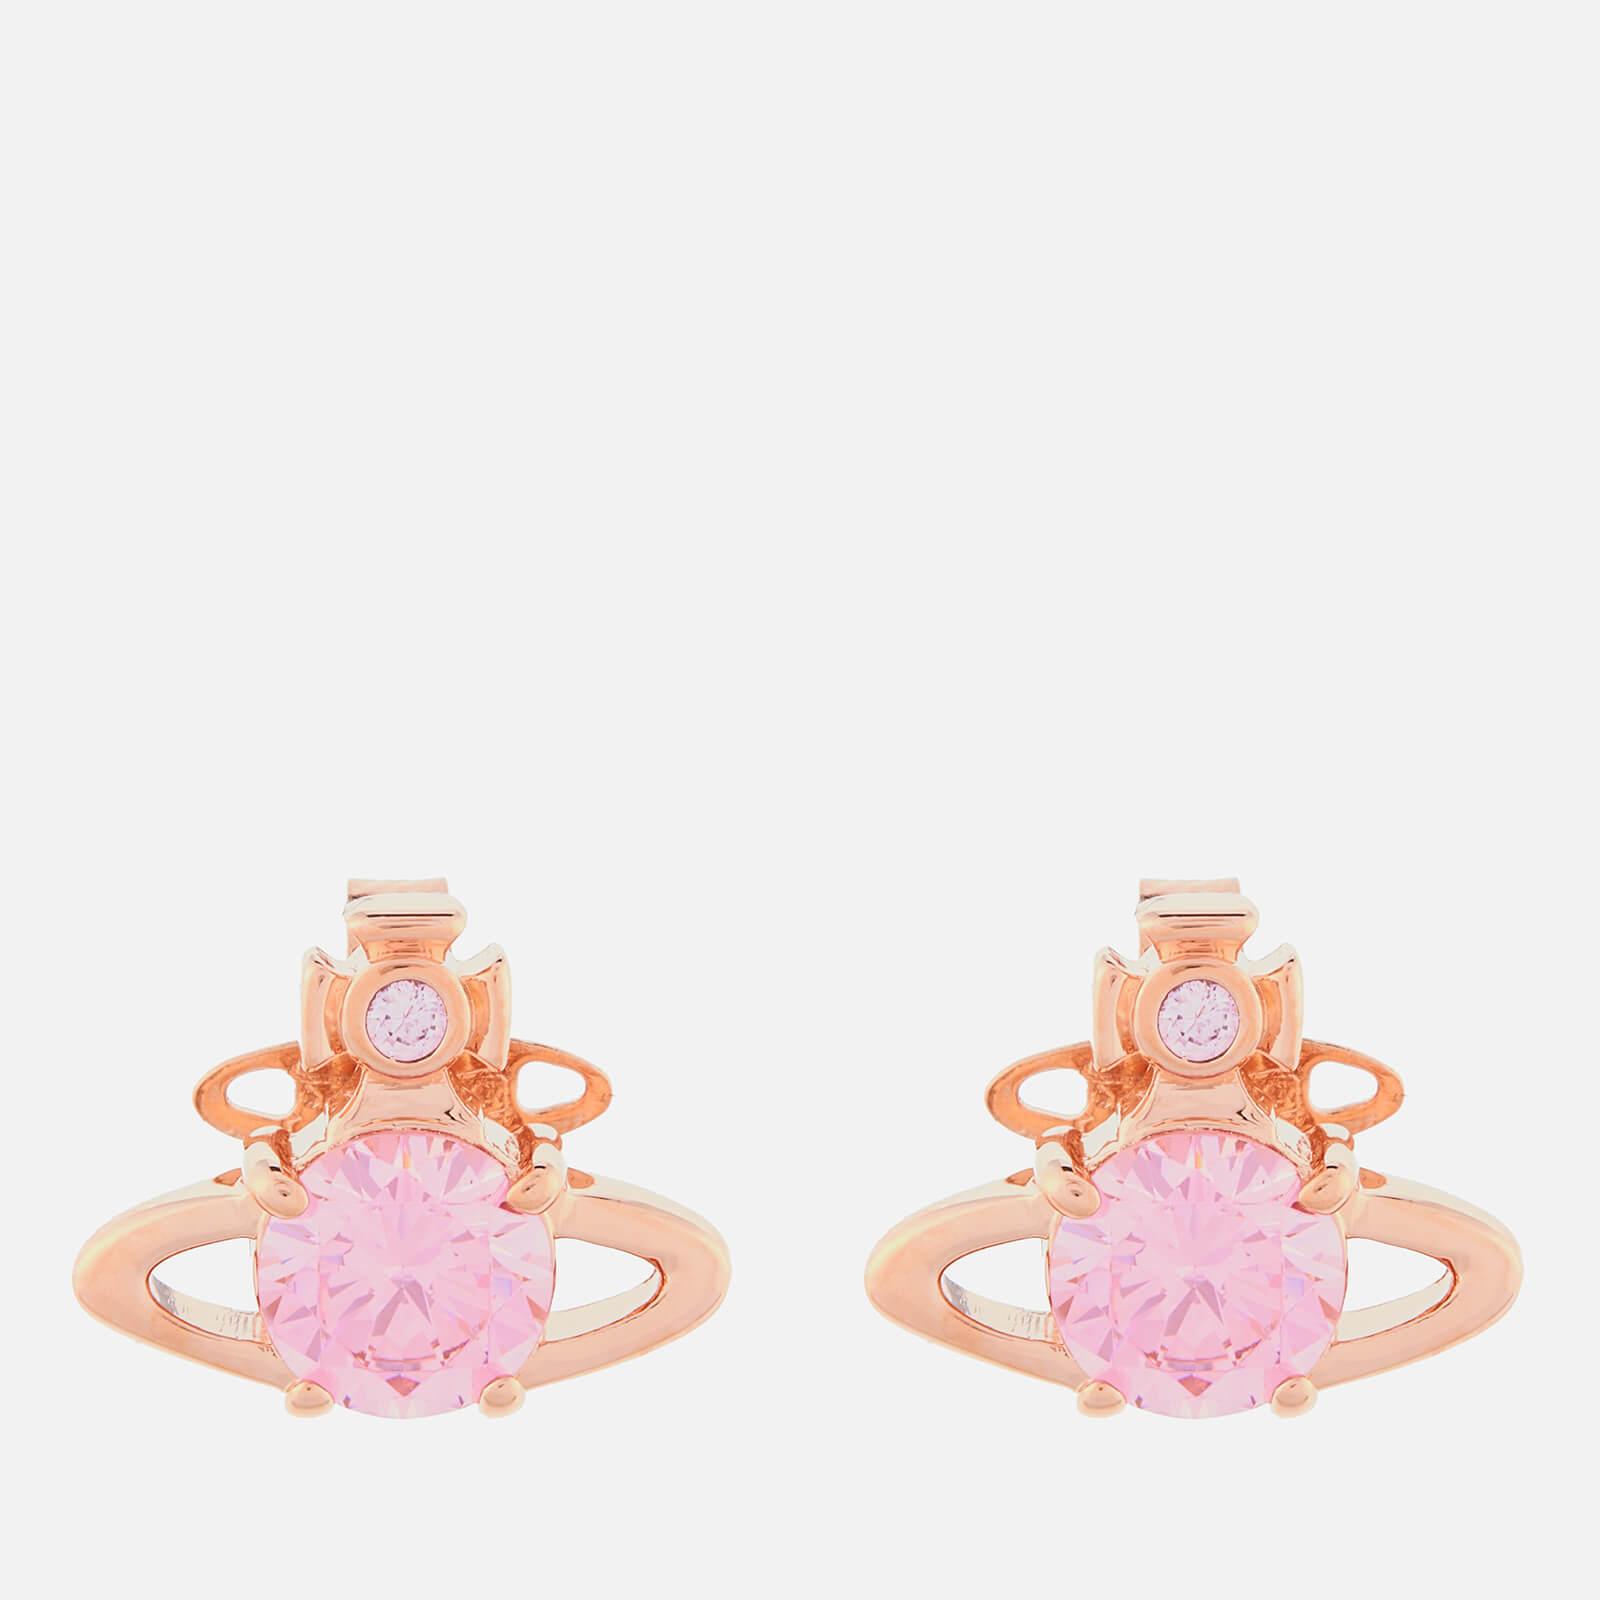 Vivienne Westwood Women's Reina Earrings - Pink Gold Pink CZ